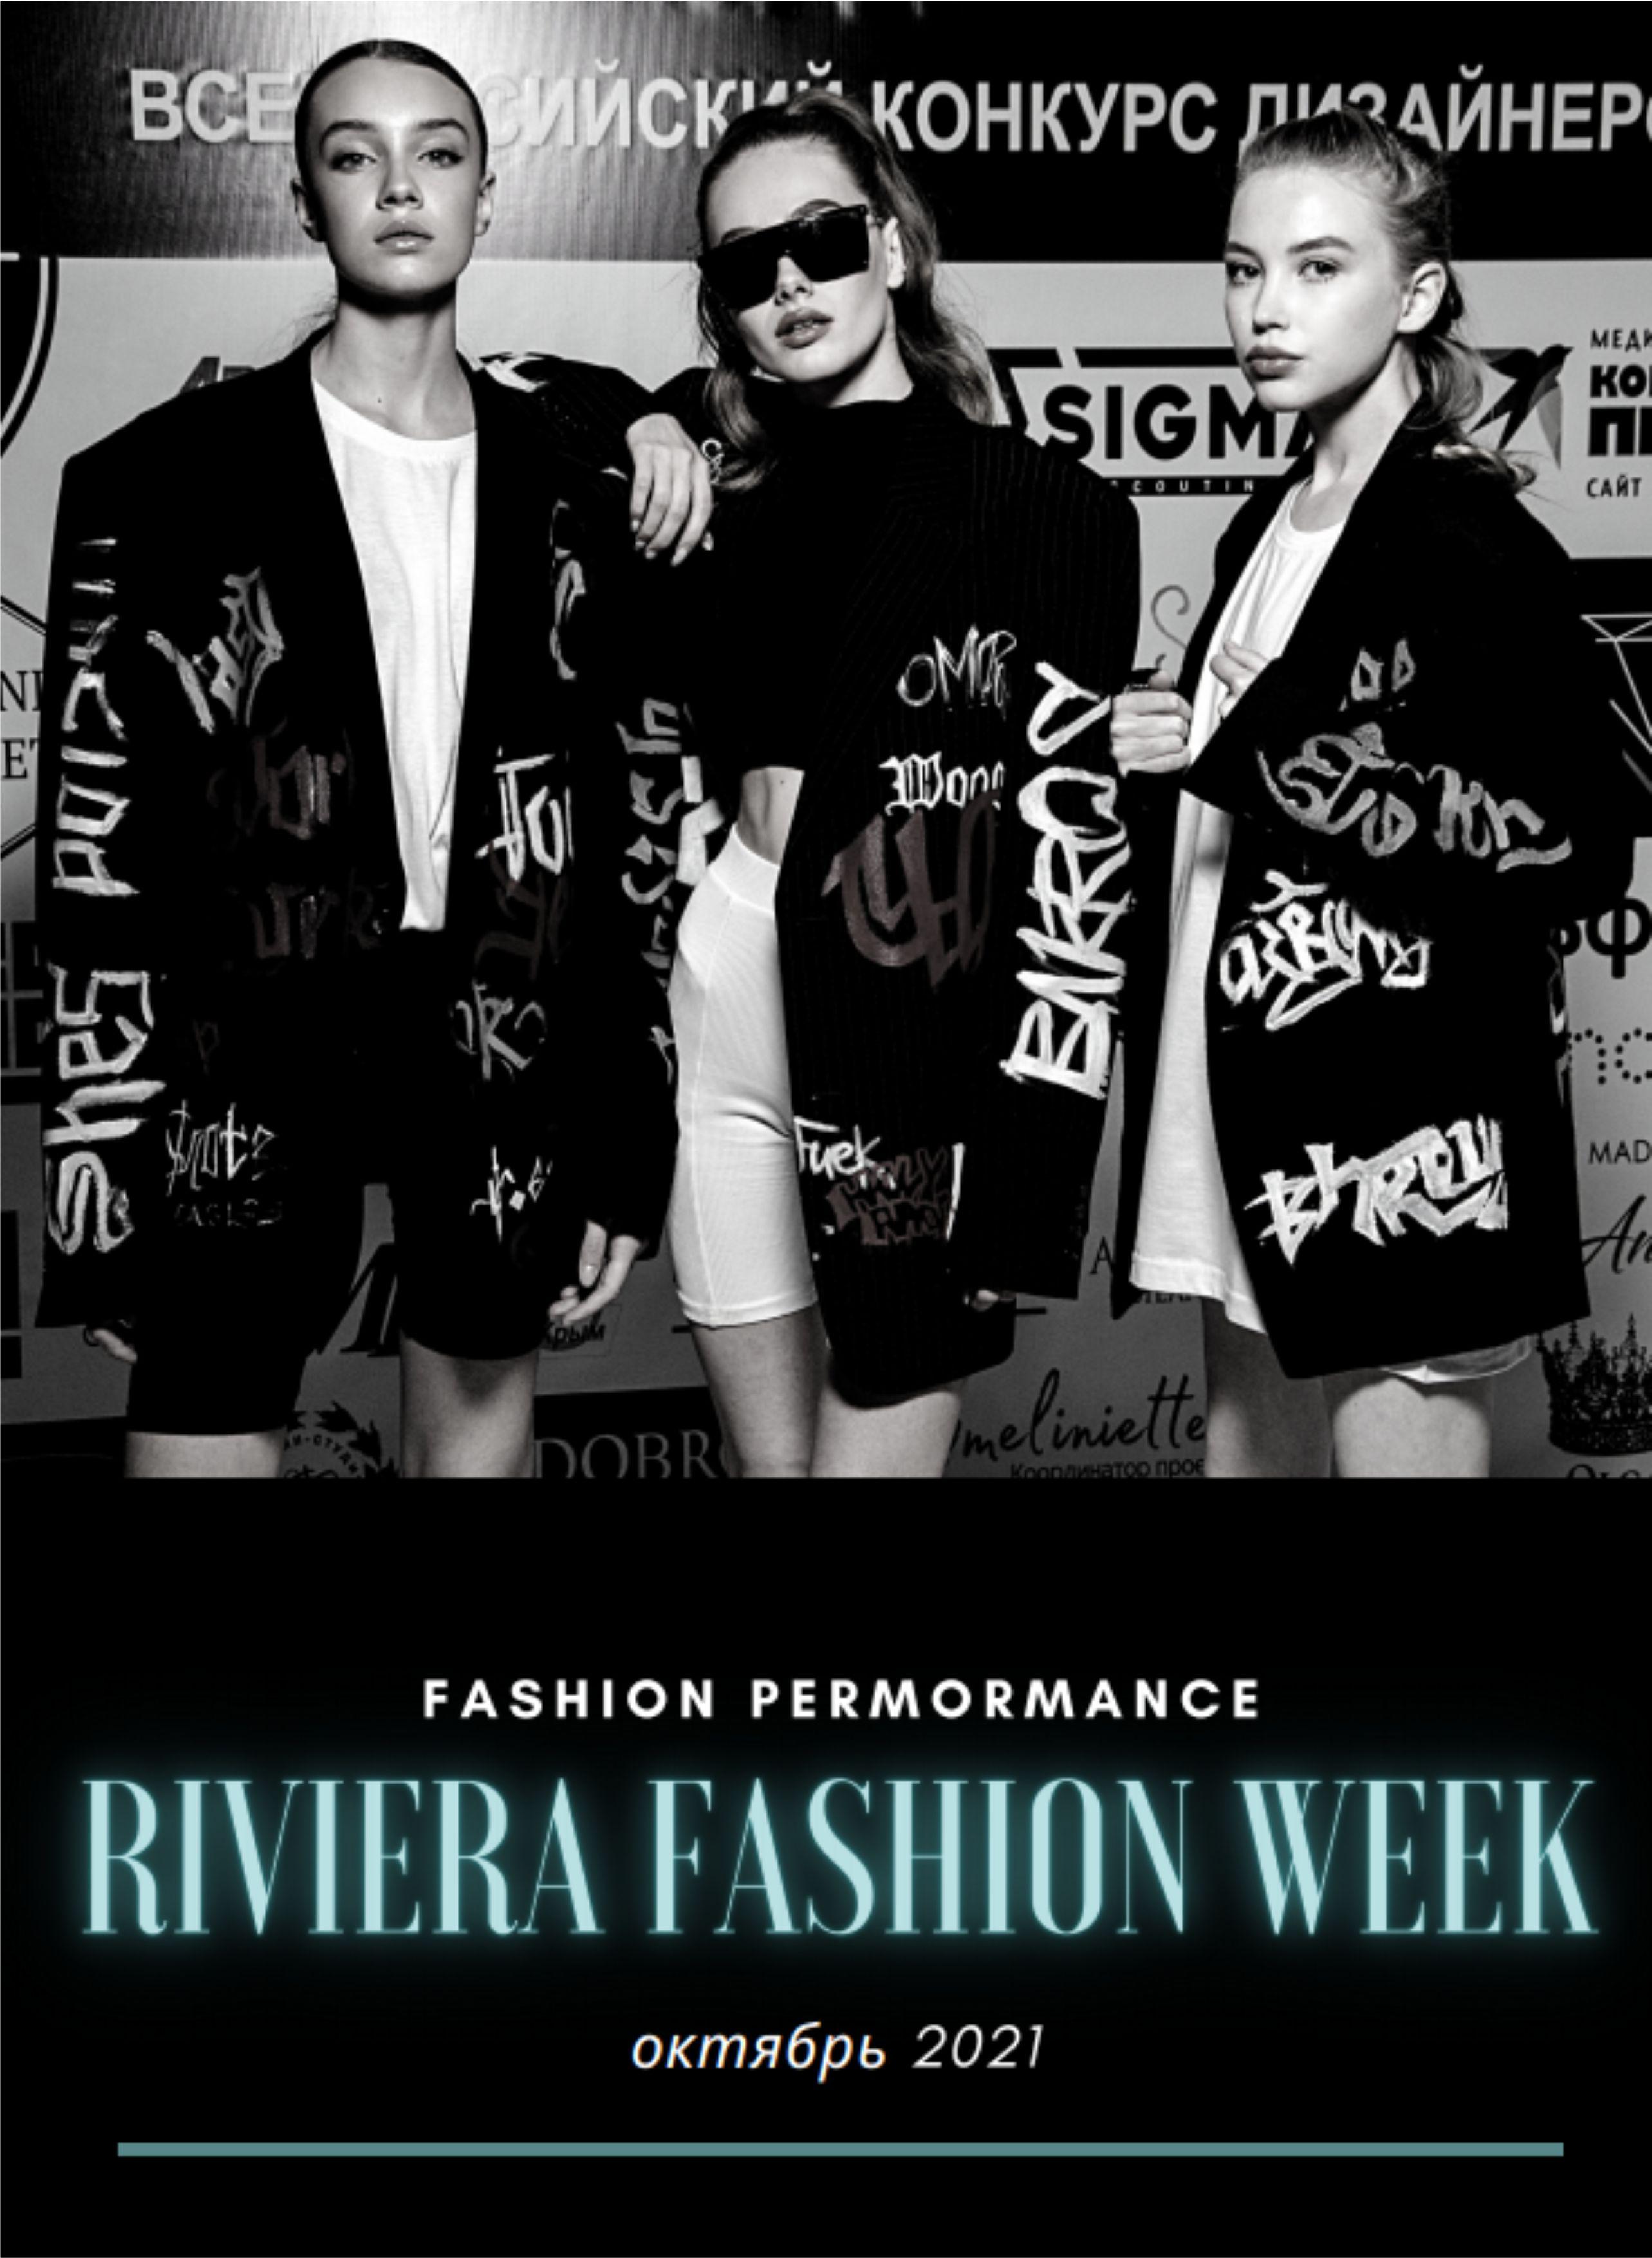 RIVIERA FASHION WEEK